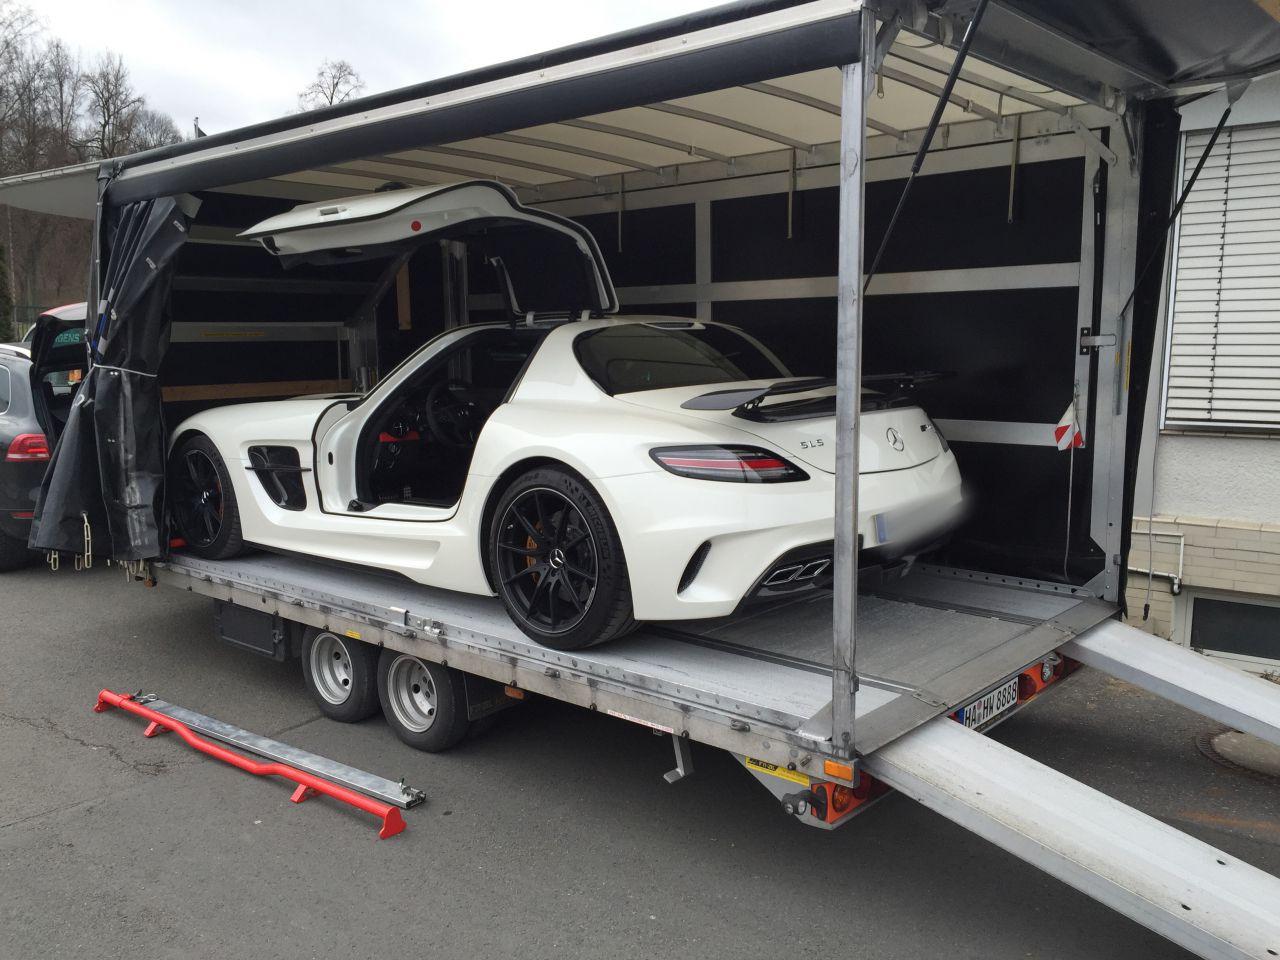 Mercedes Sls Amg Black Series geschlosserner Transport Sportwagen